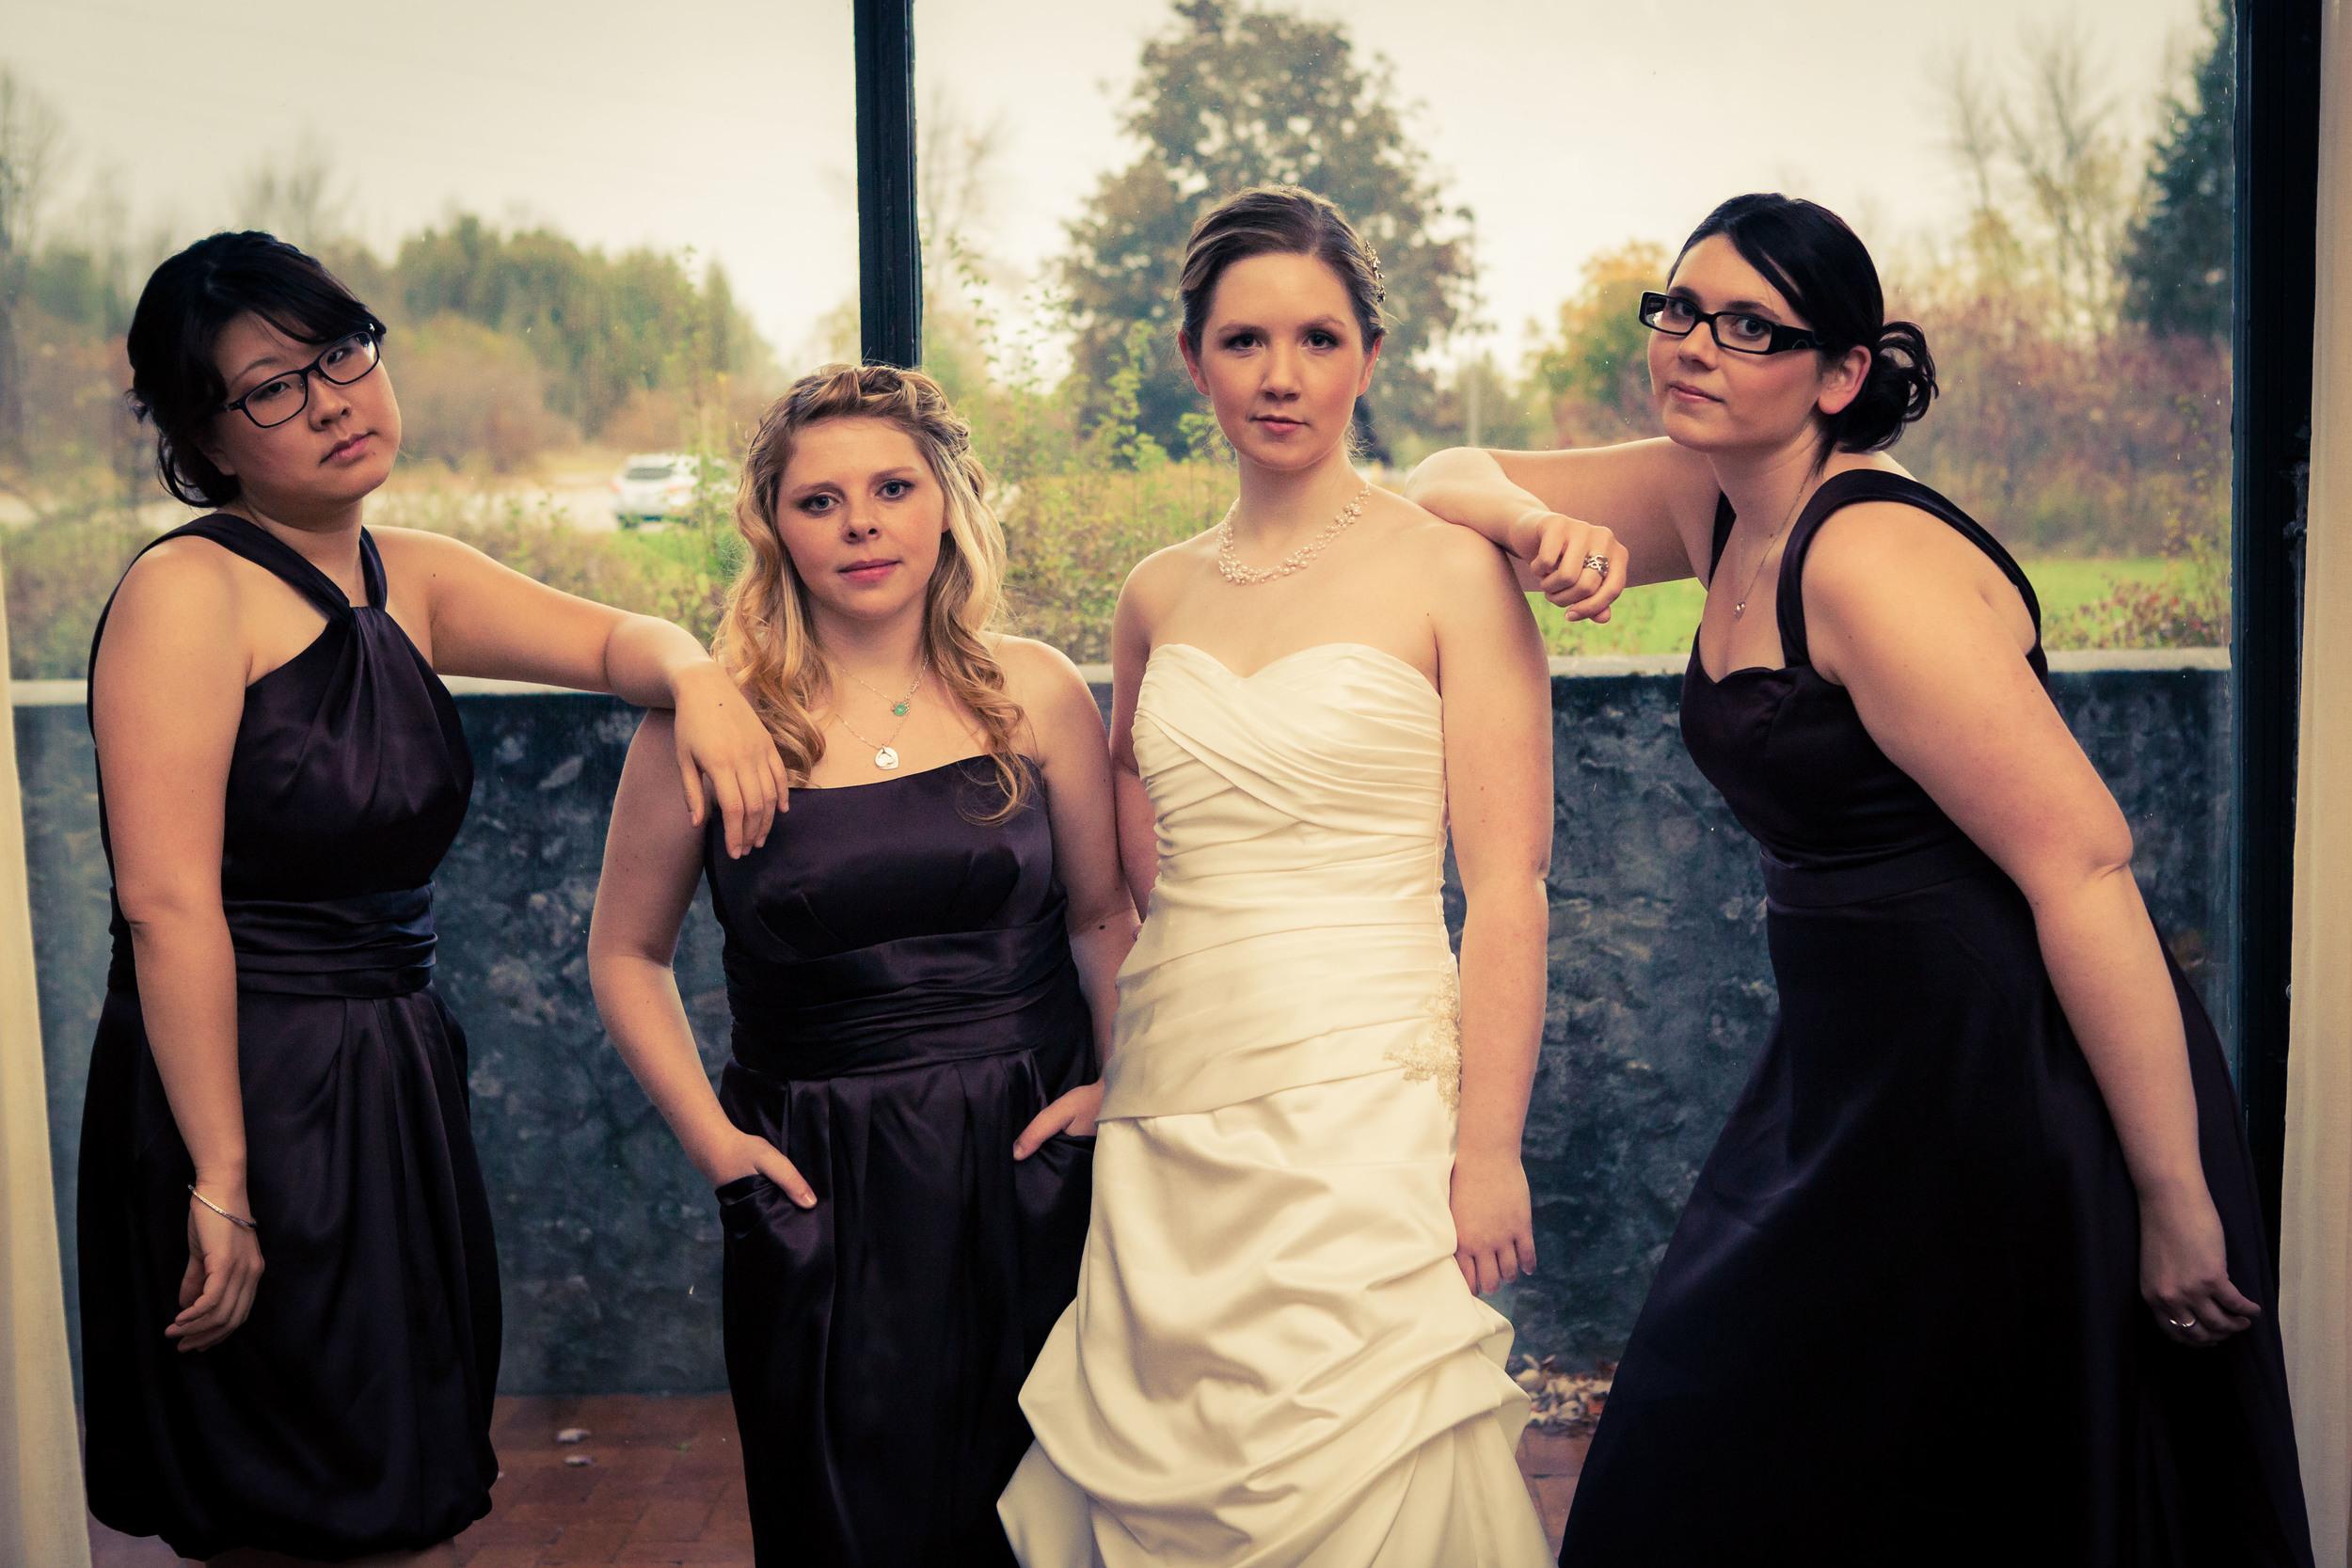 toronto_wedding_photography-Steph_Troy-17.jpg